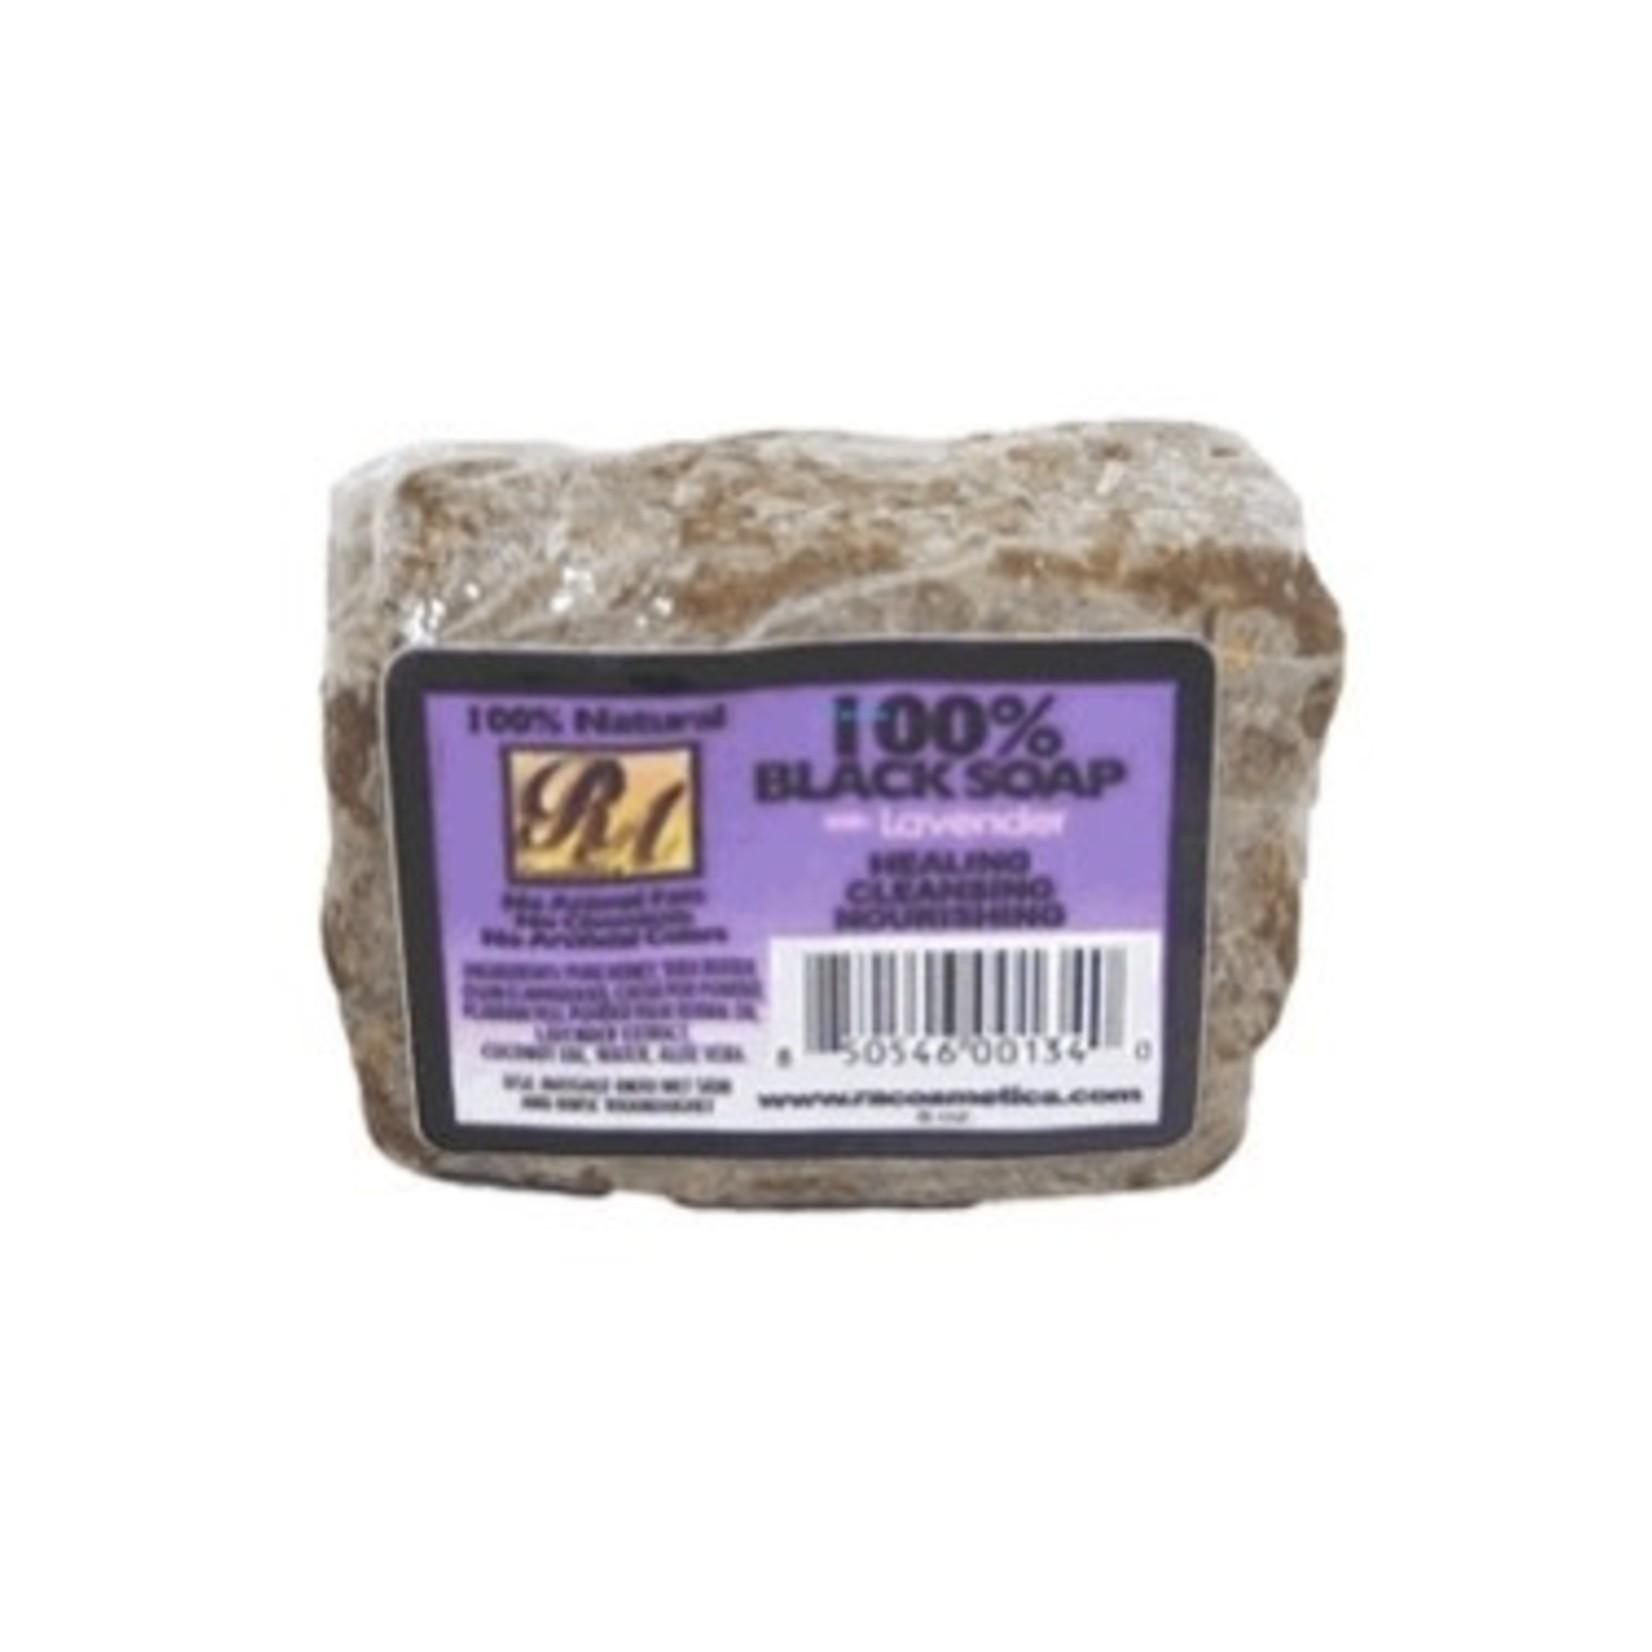 RA COSMETICS RA COSMETICS 100% BLACK SOAP - LAVENDER [5OZ]